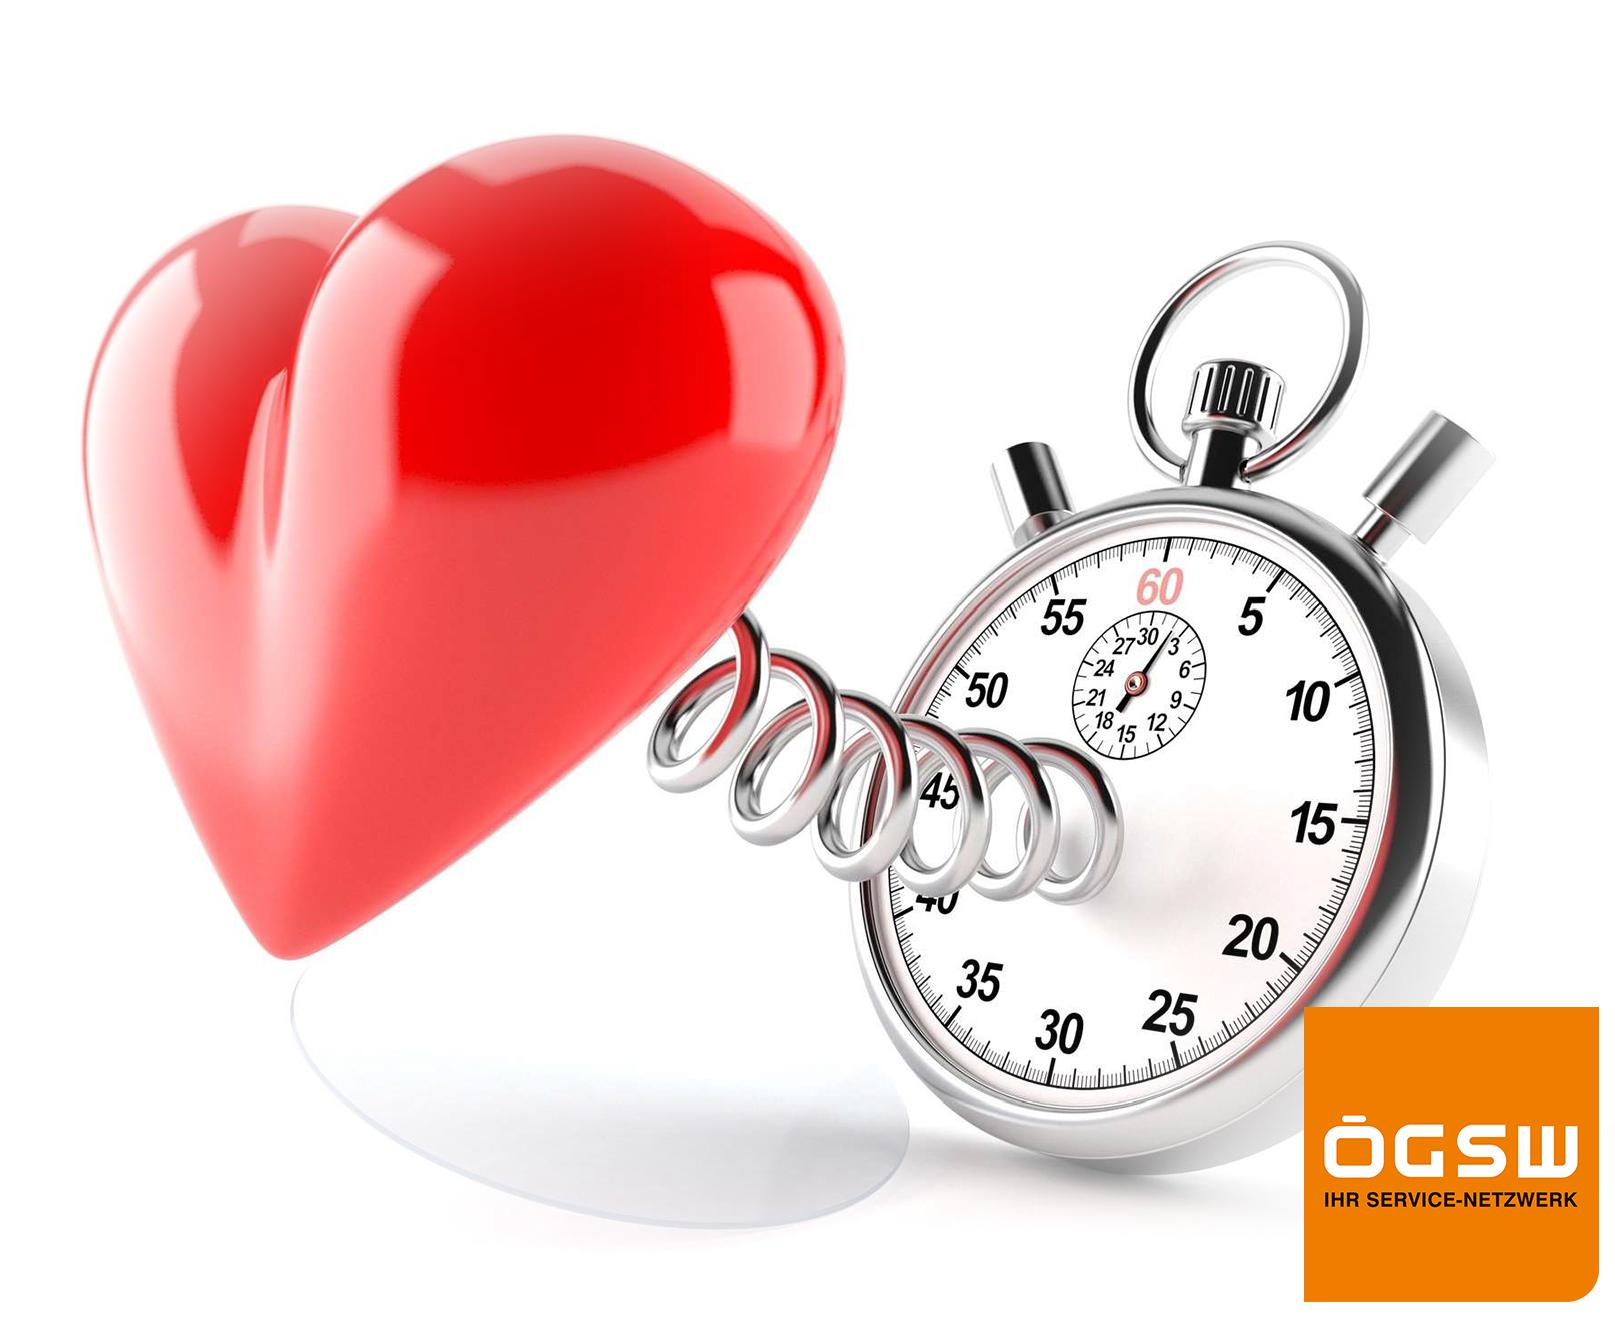 CITY Speed Dating Kalender - City Speed Dating: Termine